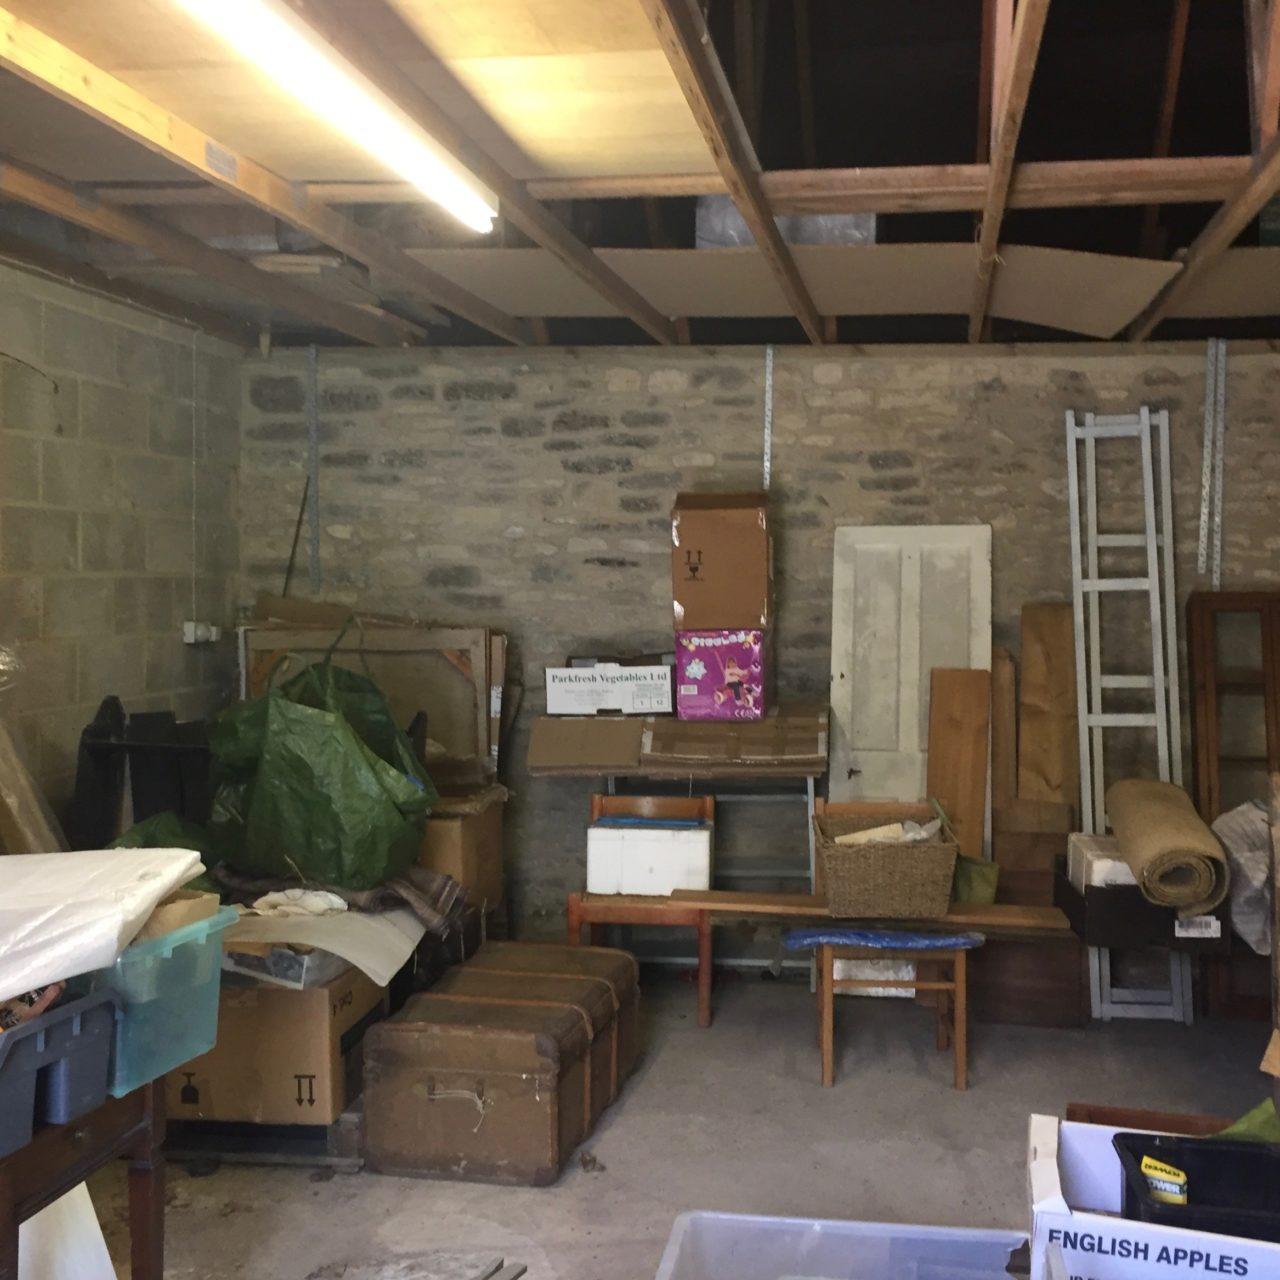 the original interior of the garage